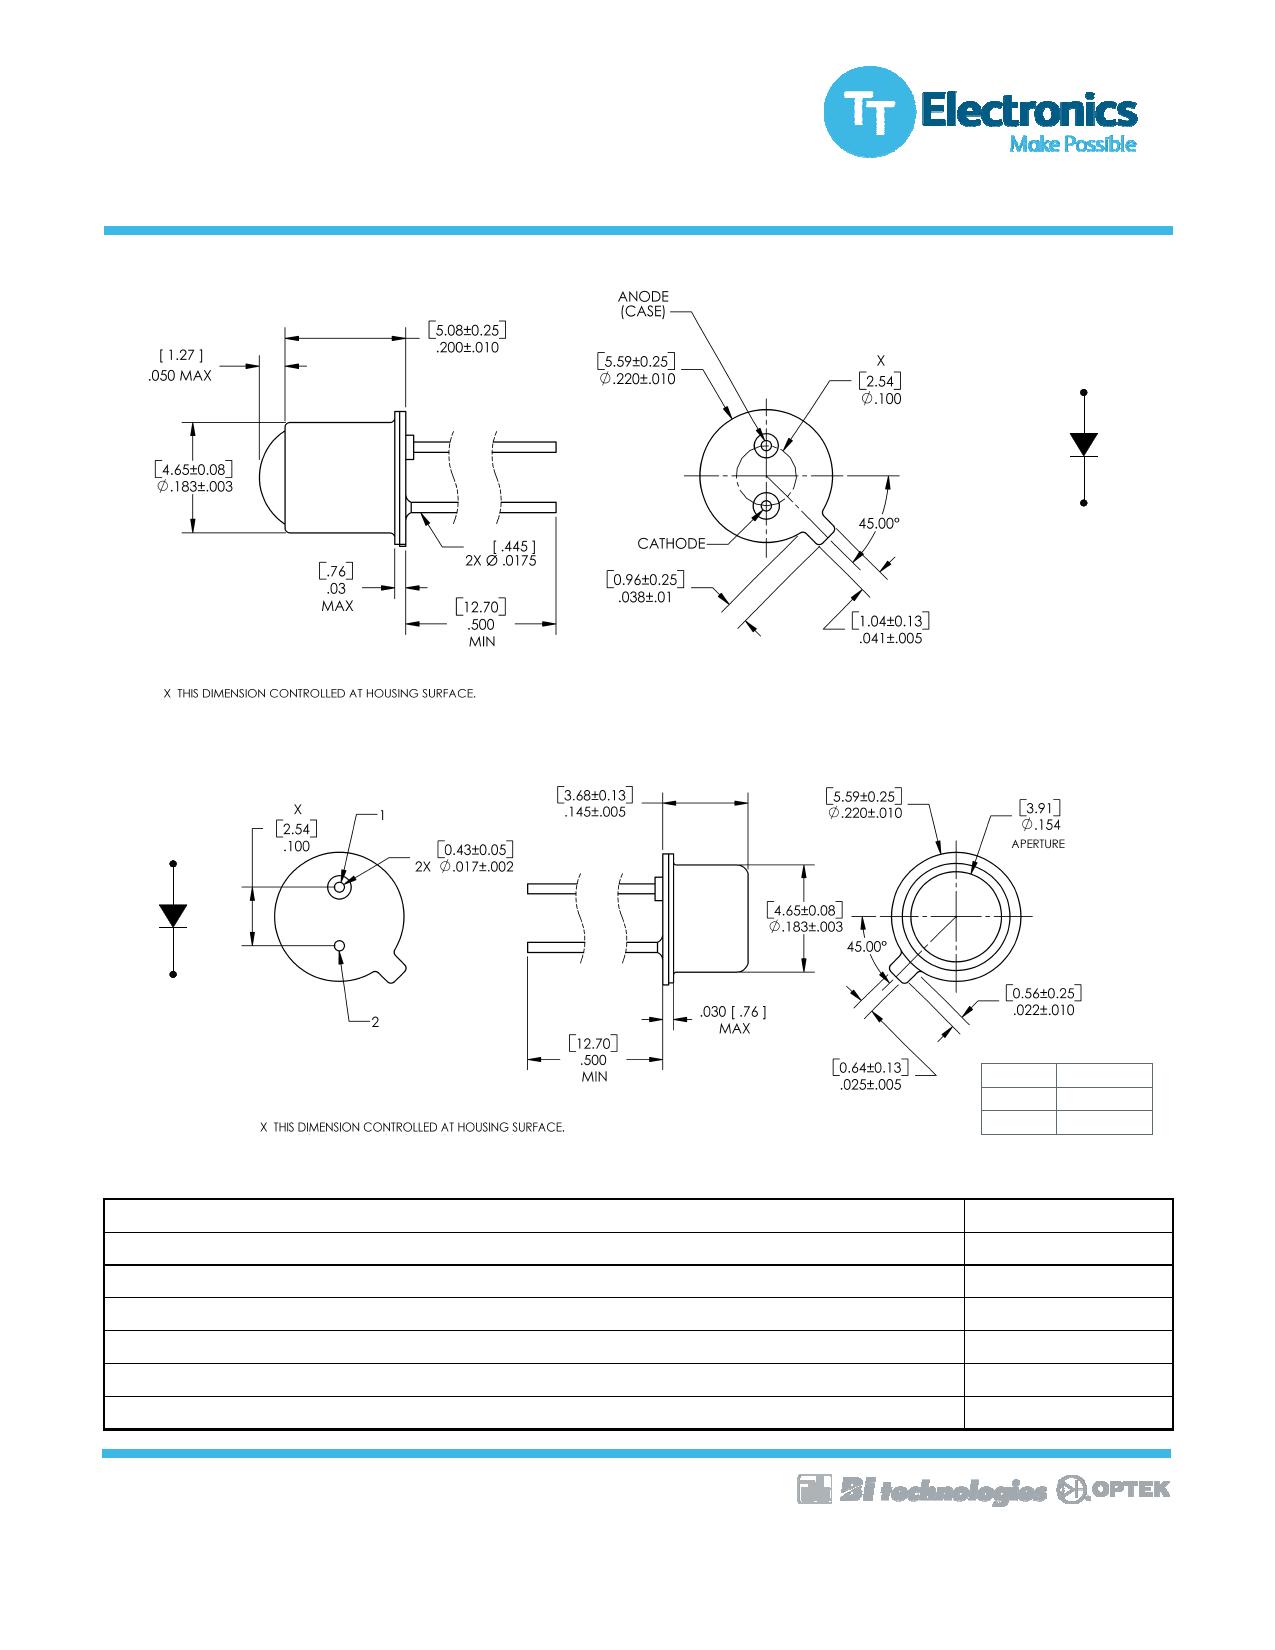 OP230 pdf, schematic